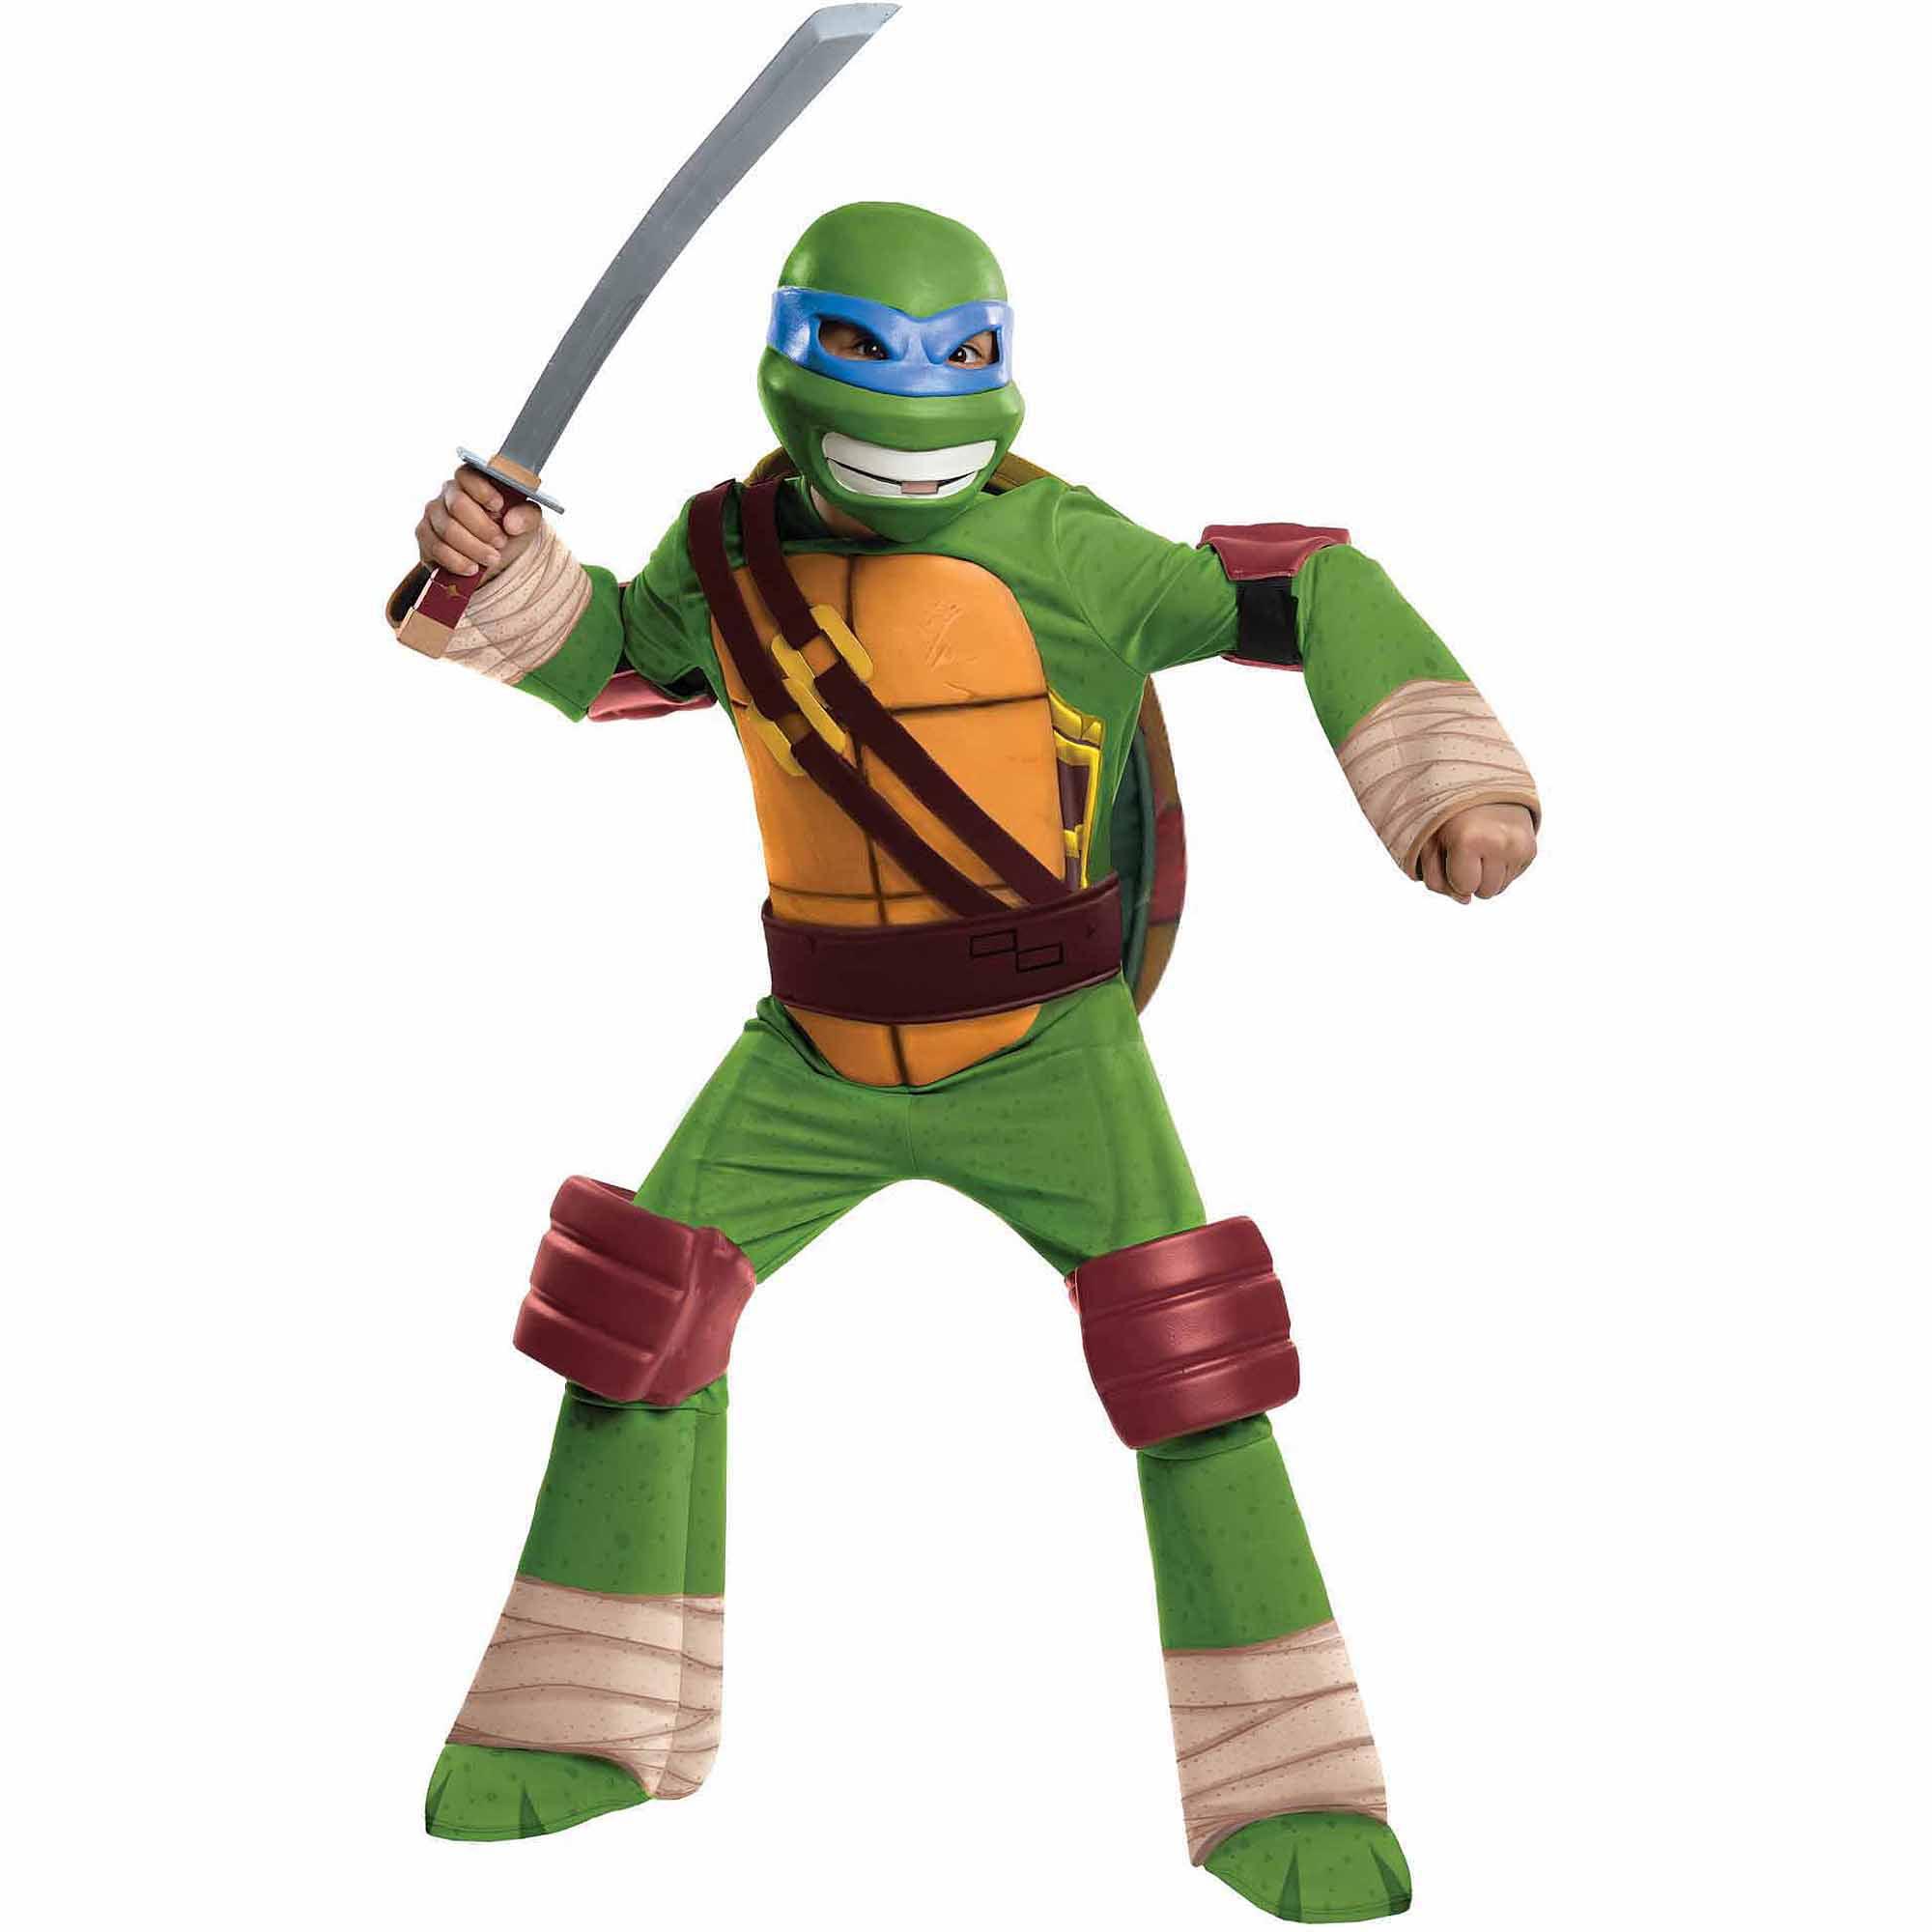 Teenage Mutant Ninja Turtles Leonardo Deluxe Child Halloween Costume